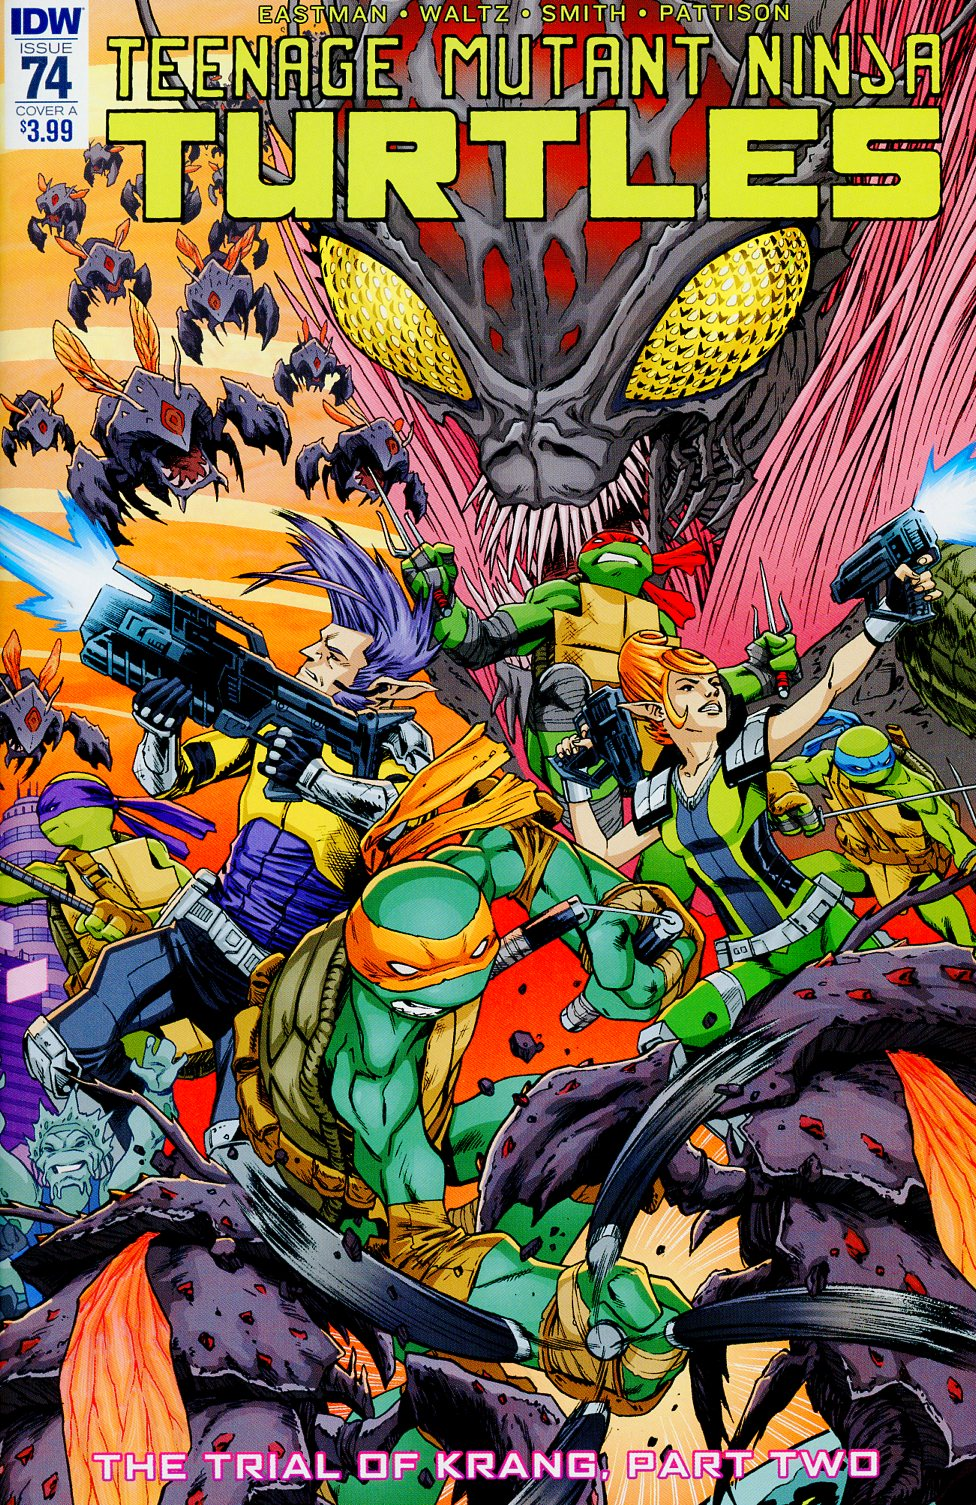 Teenage Mutant Ninja Turtles Vol 5 #74 Cover A Regular Cory Smith Cover